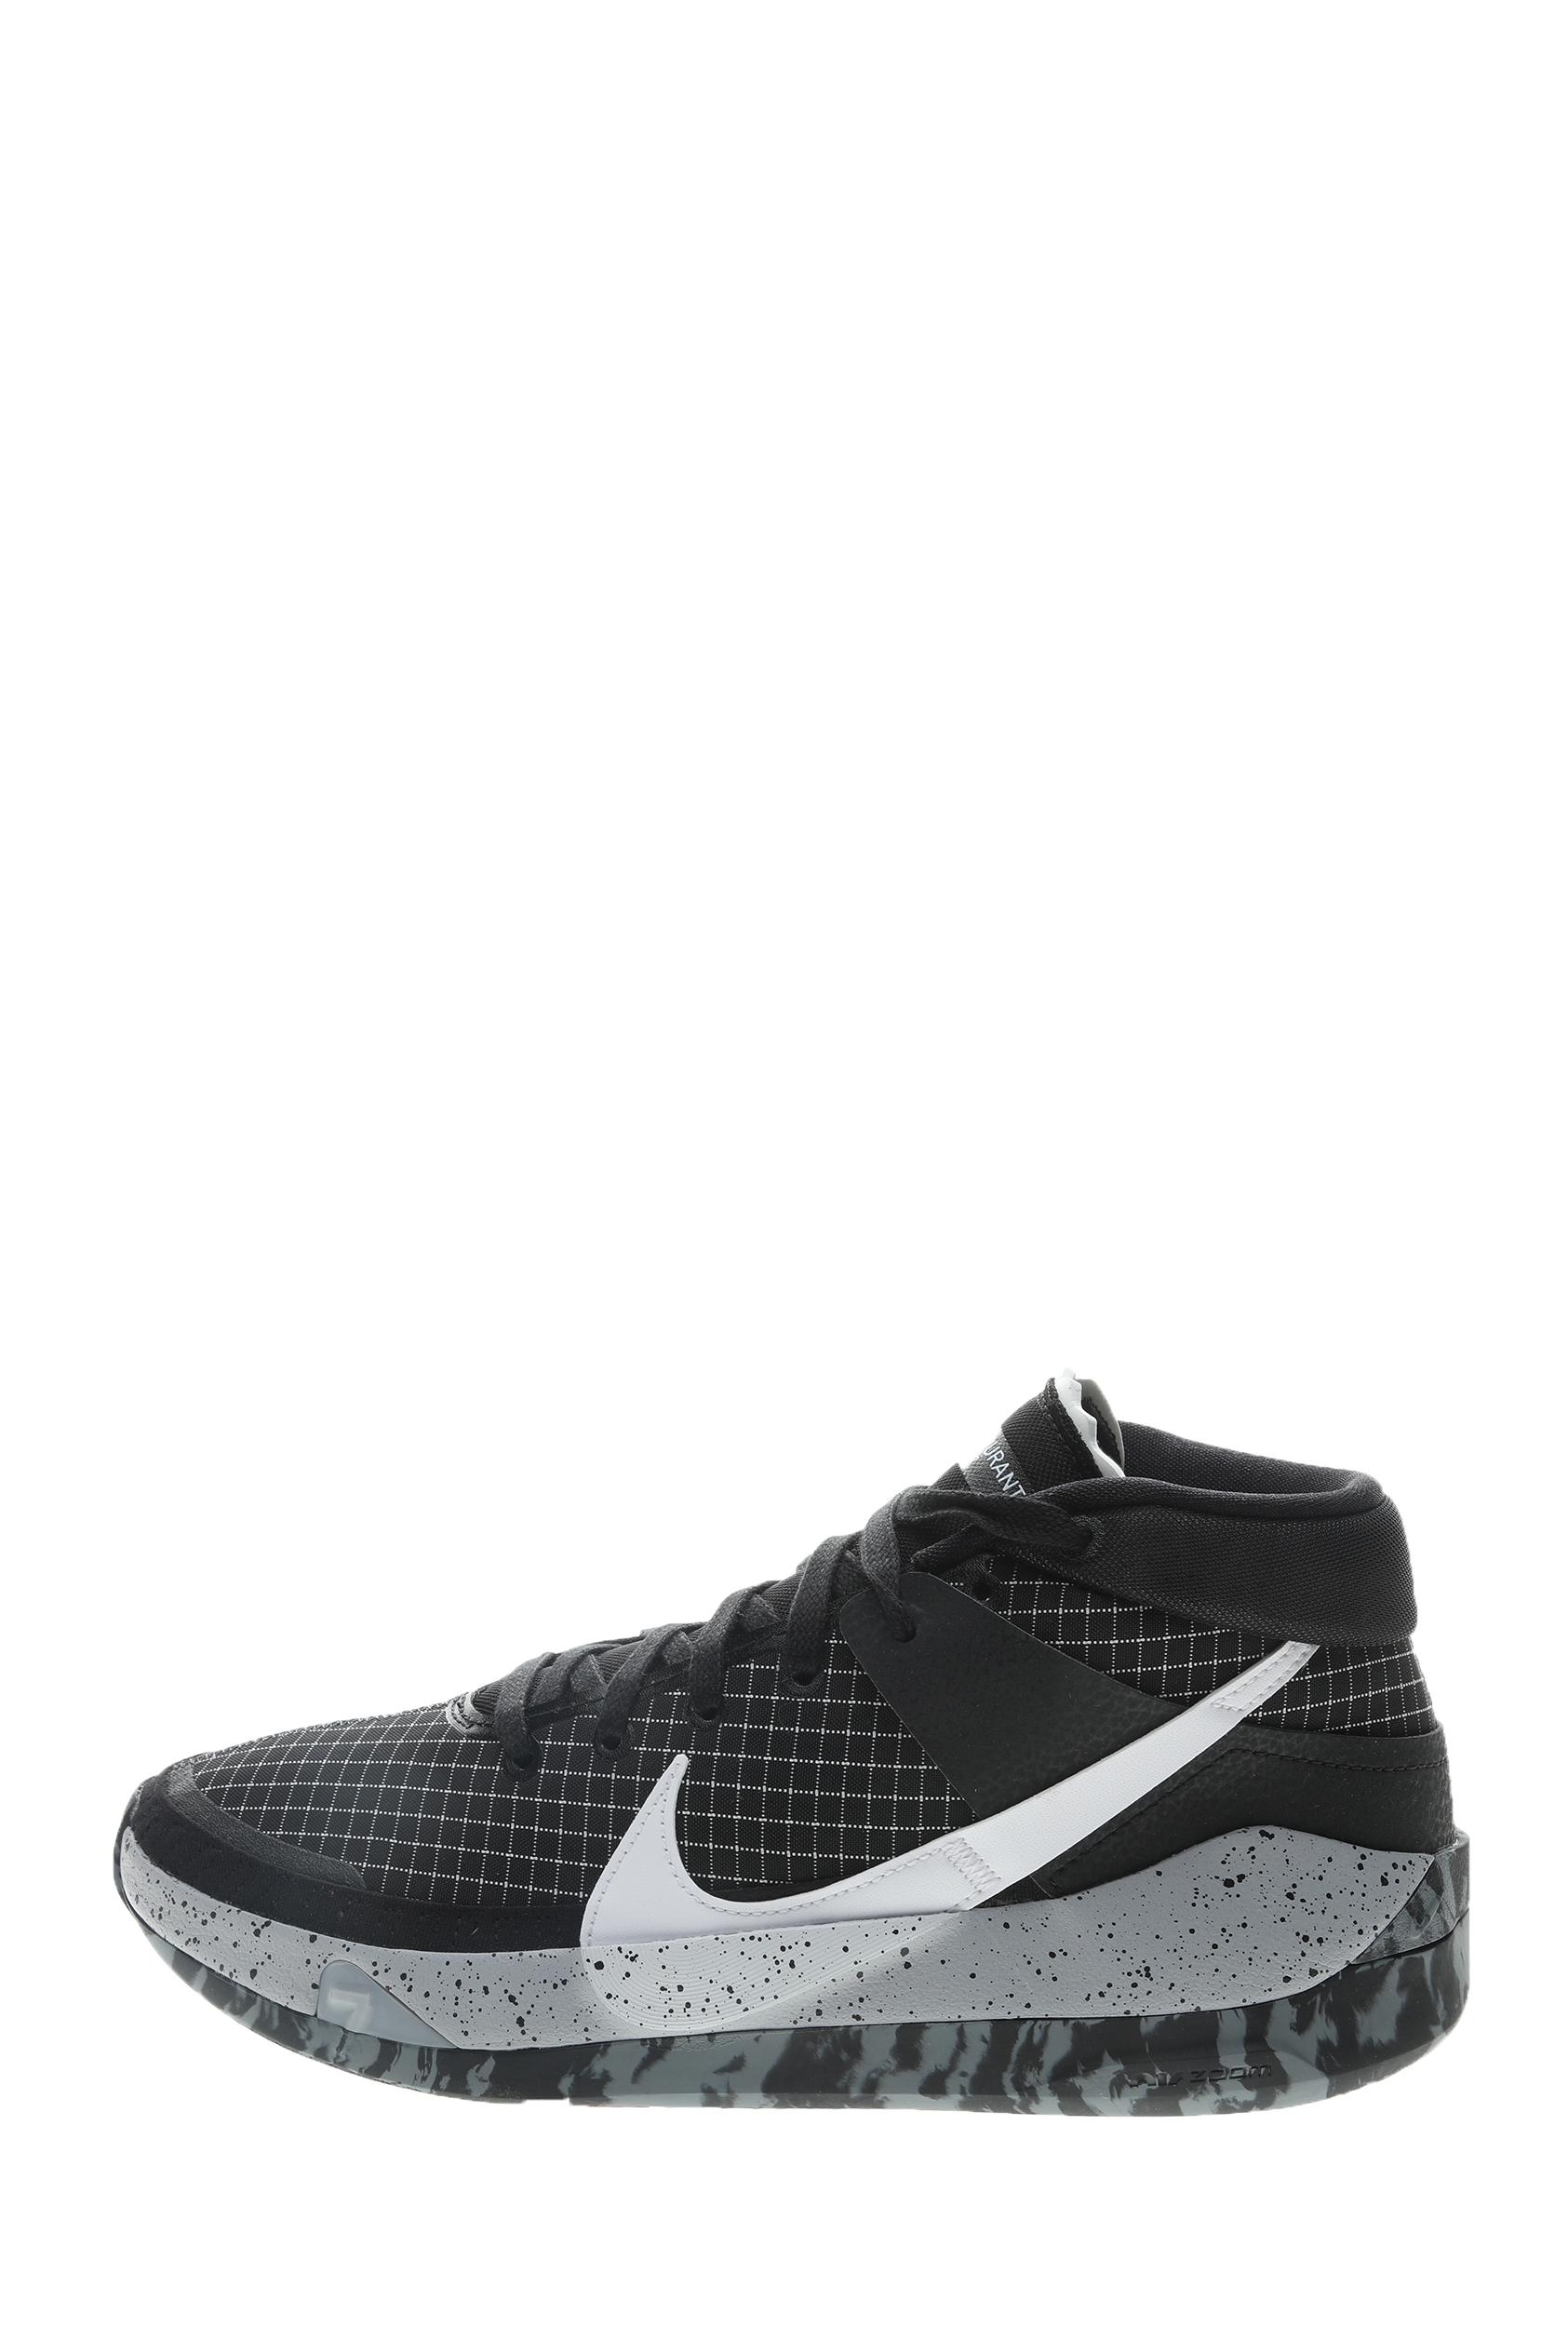 NIKE – Ανδρικά παπούτσια basketball ΝΙΚΕ KD13 μαύρα